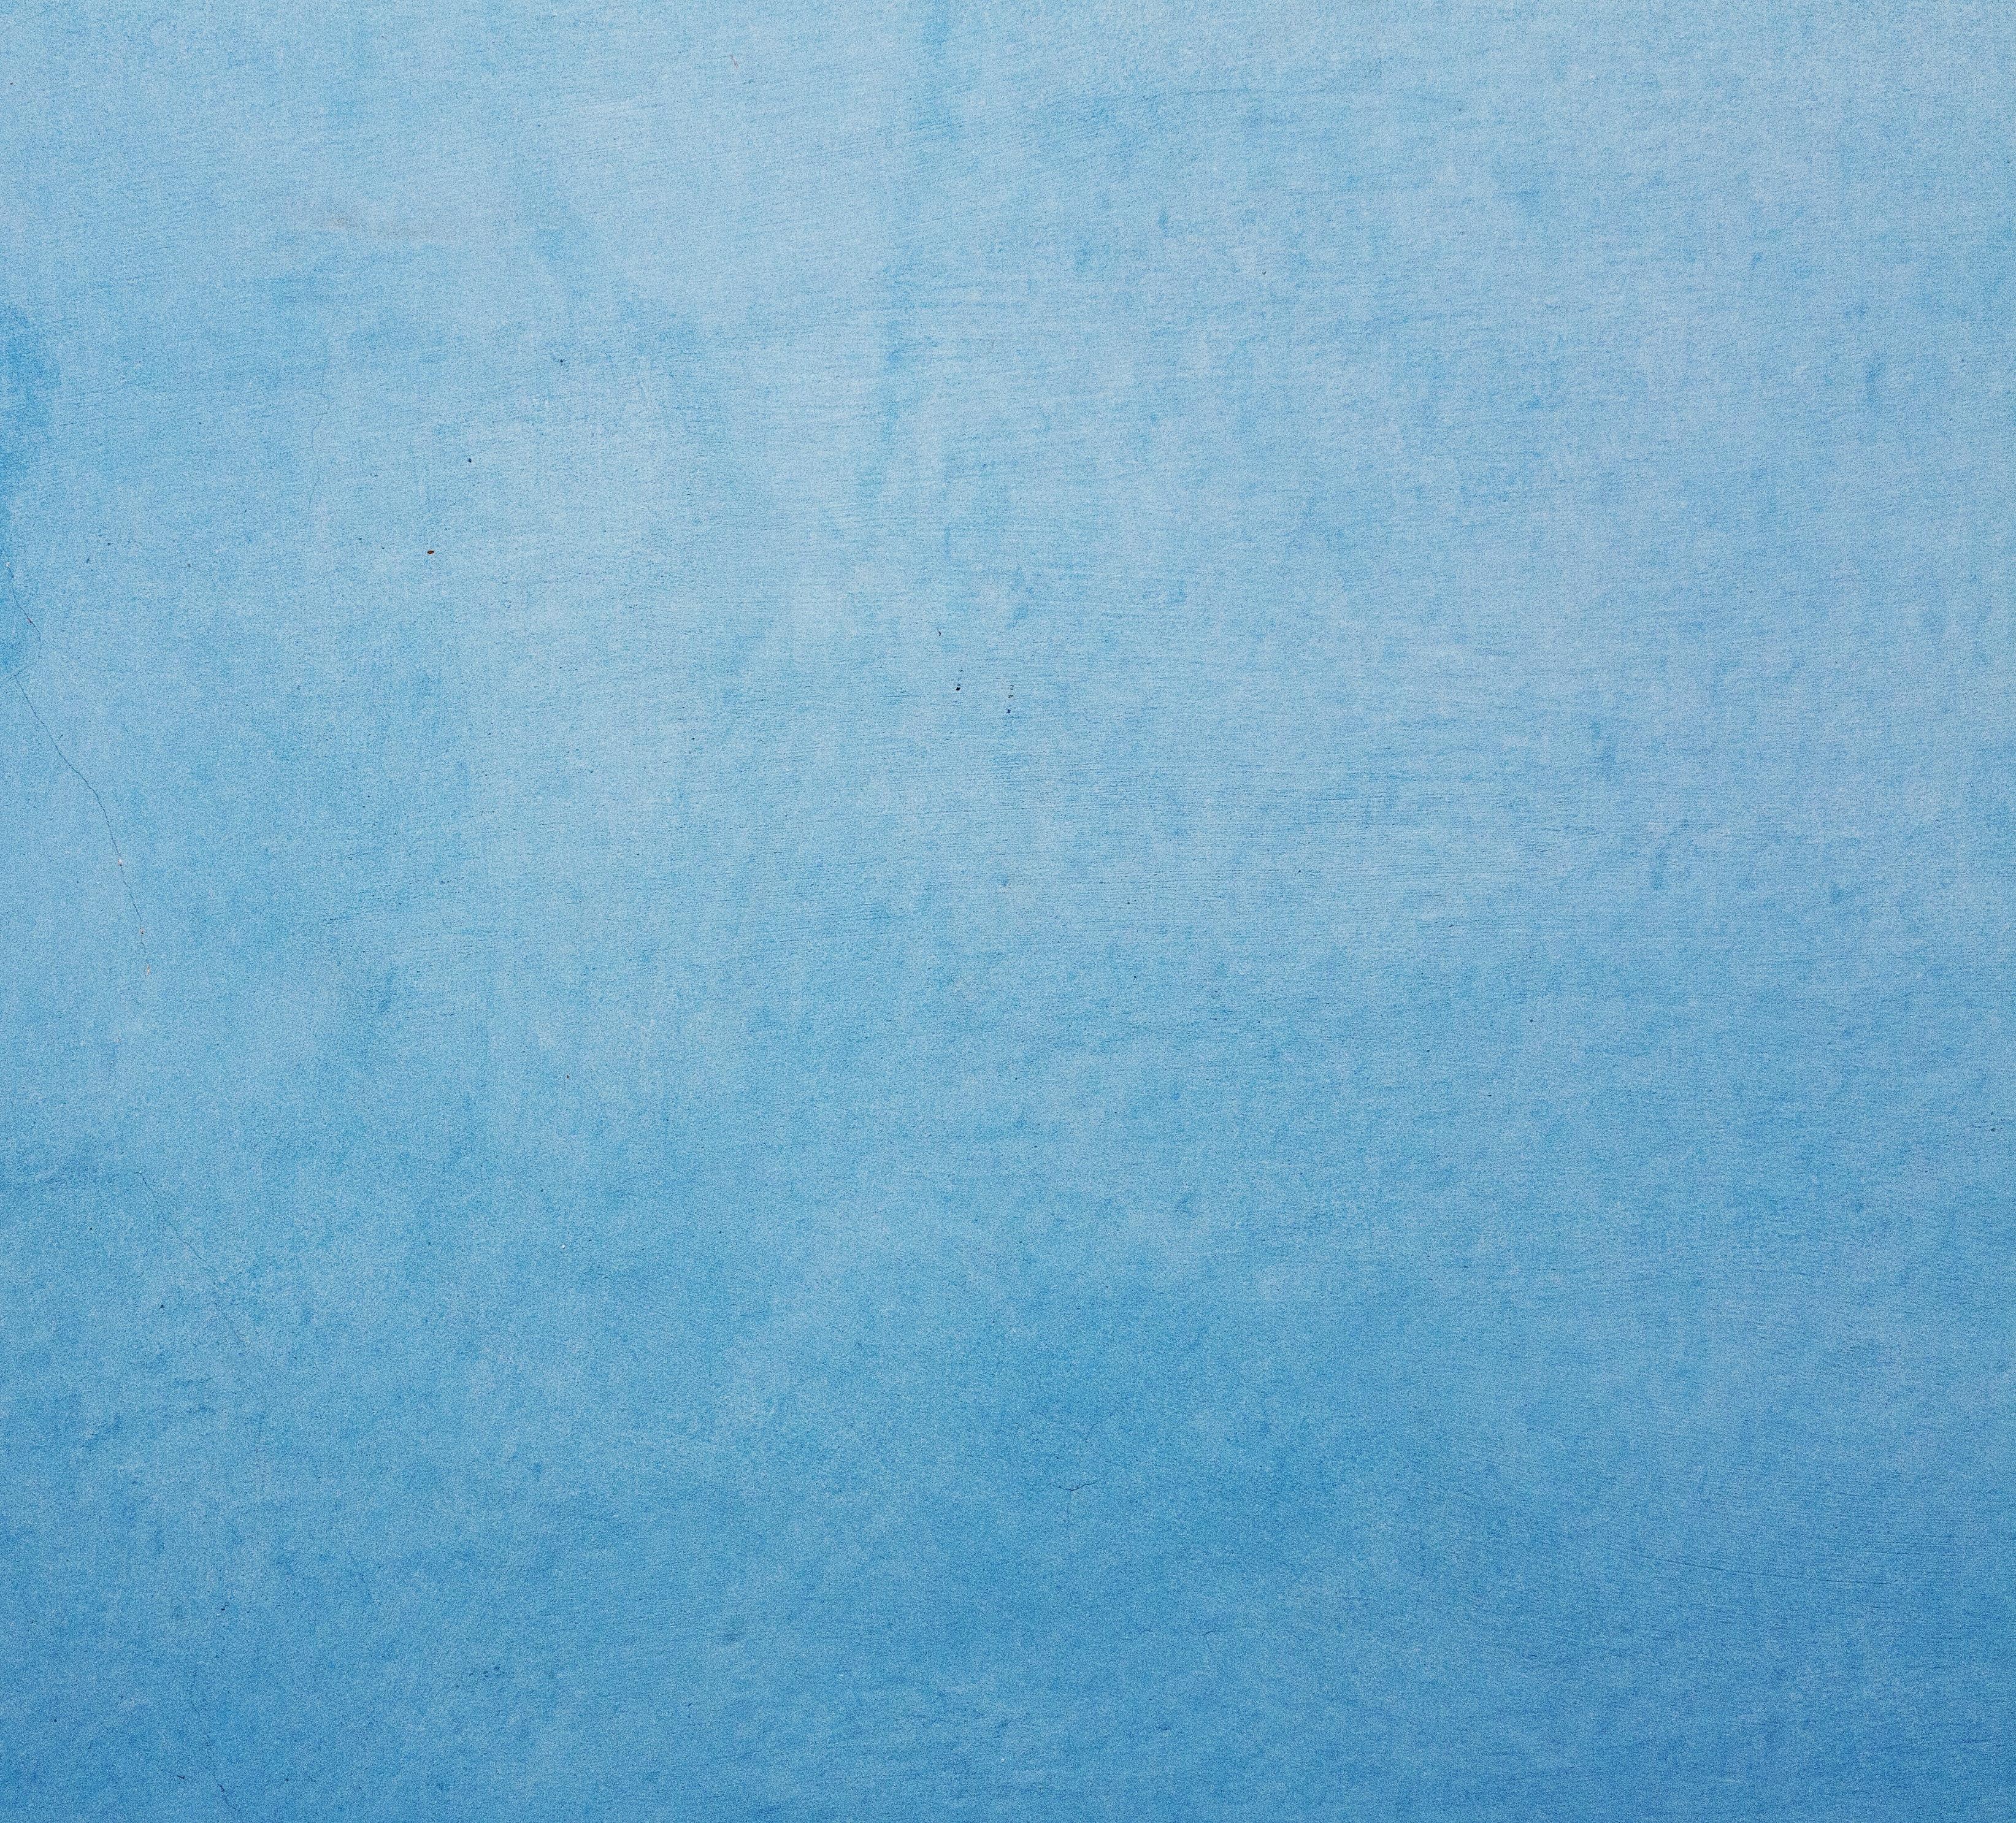 blue vintage background wallpaper picture hd blue vintage 3287x2973